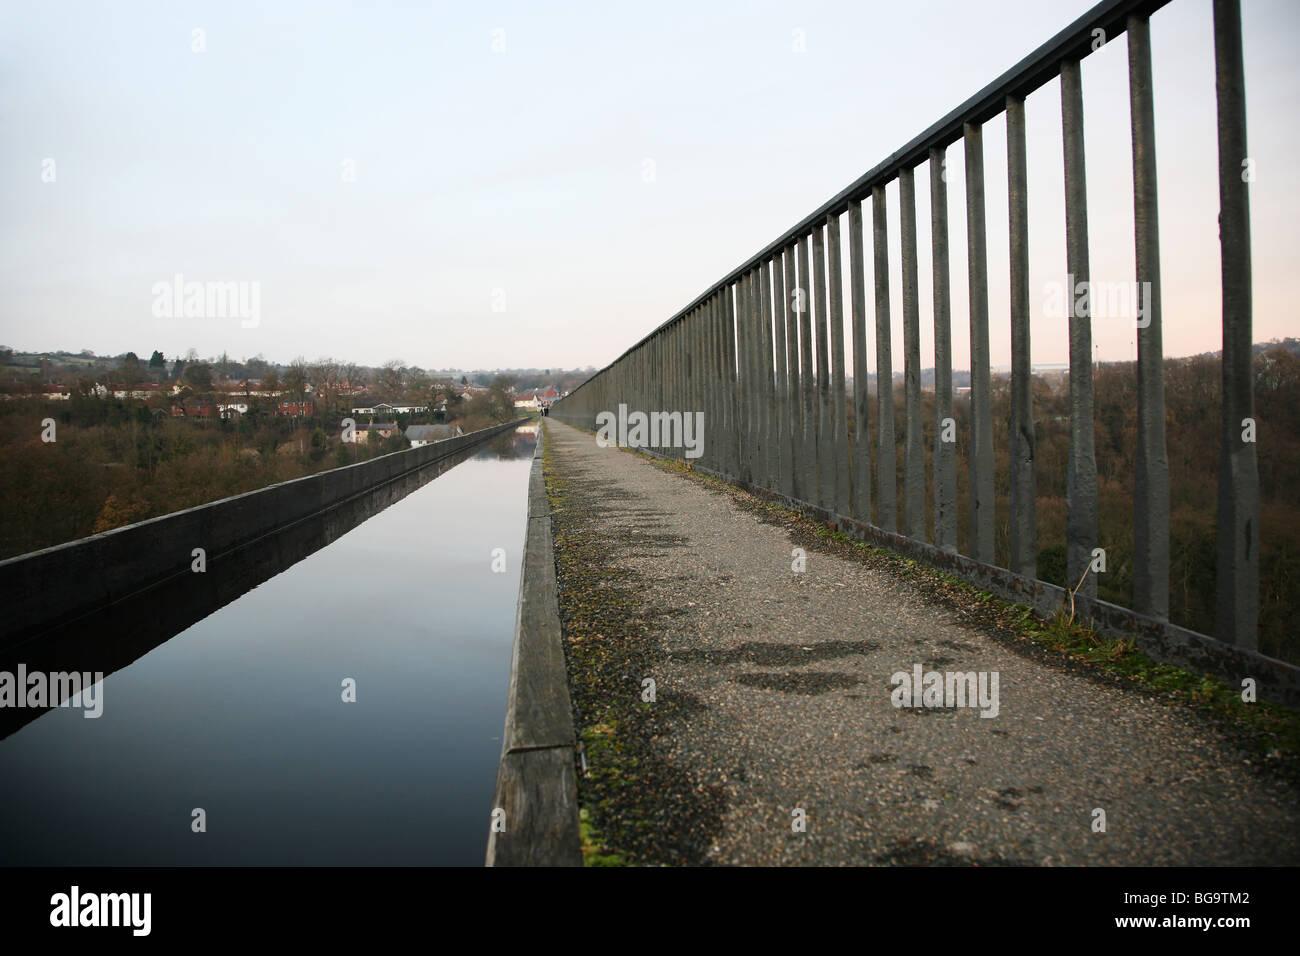 Towpath on the Pontcysyllte Aqueduct nr. Llangollen, Wales - Stock Image